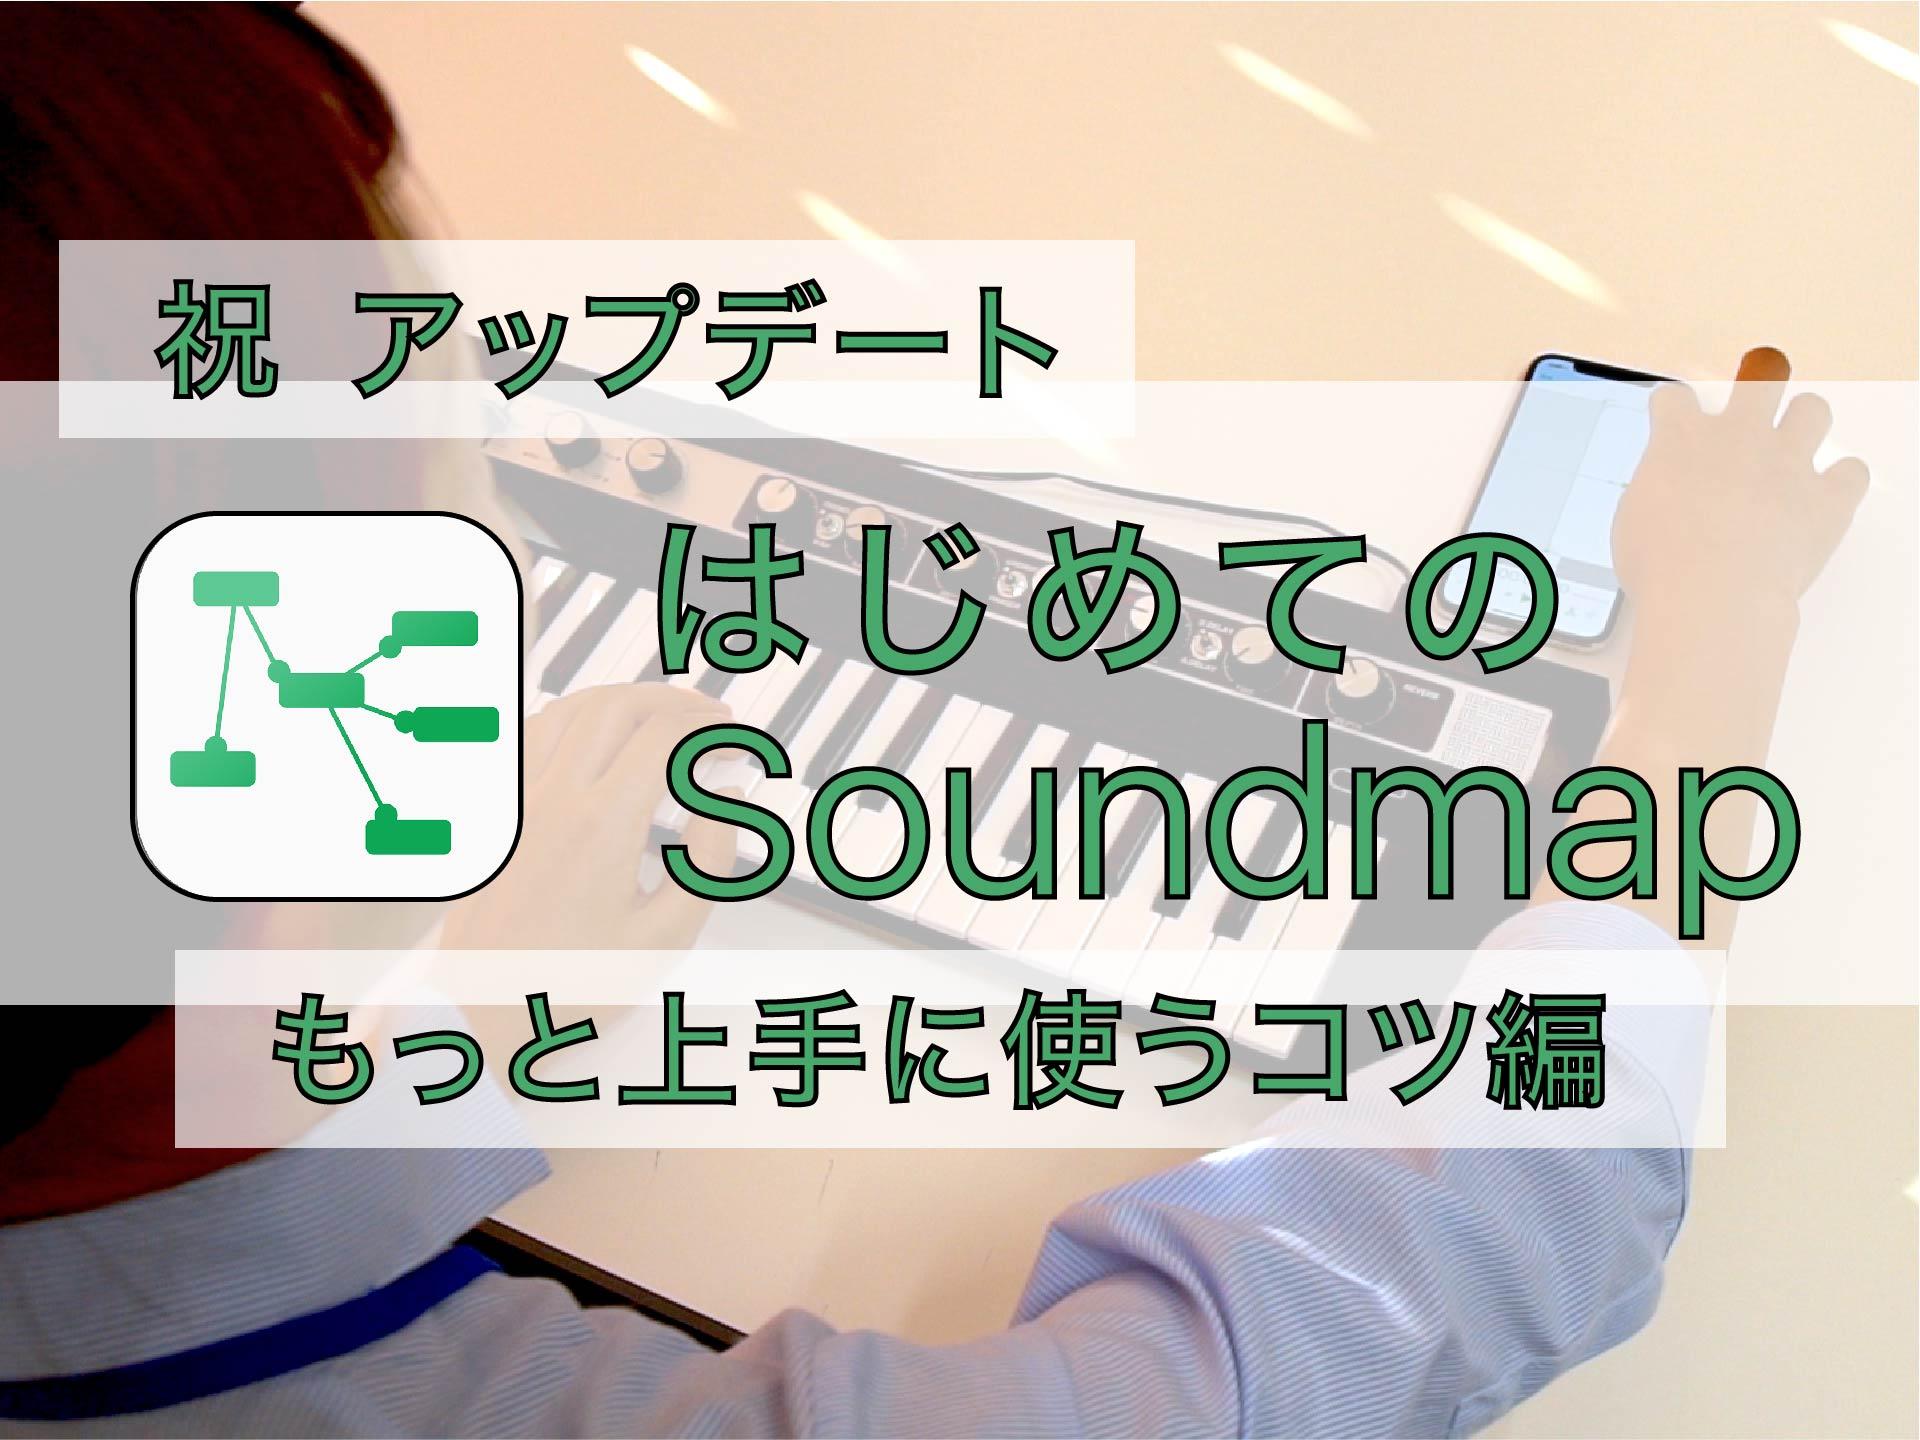 Soundmap_サムネ_もっと上手に使うコツ編-01